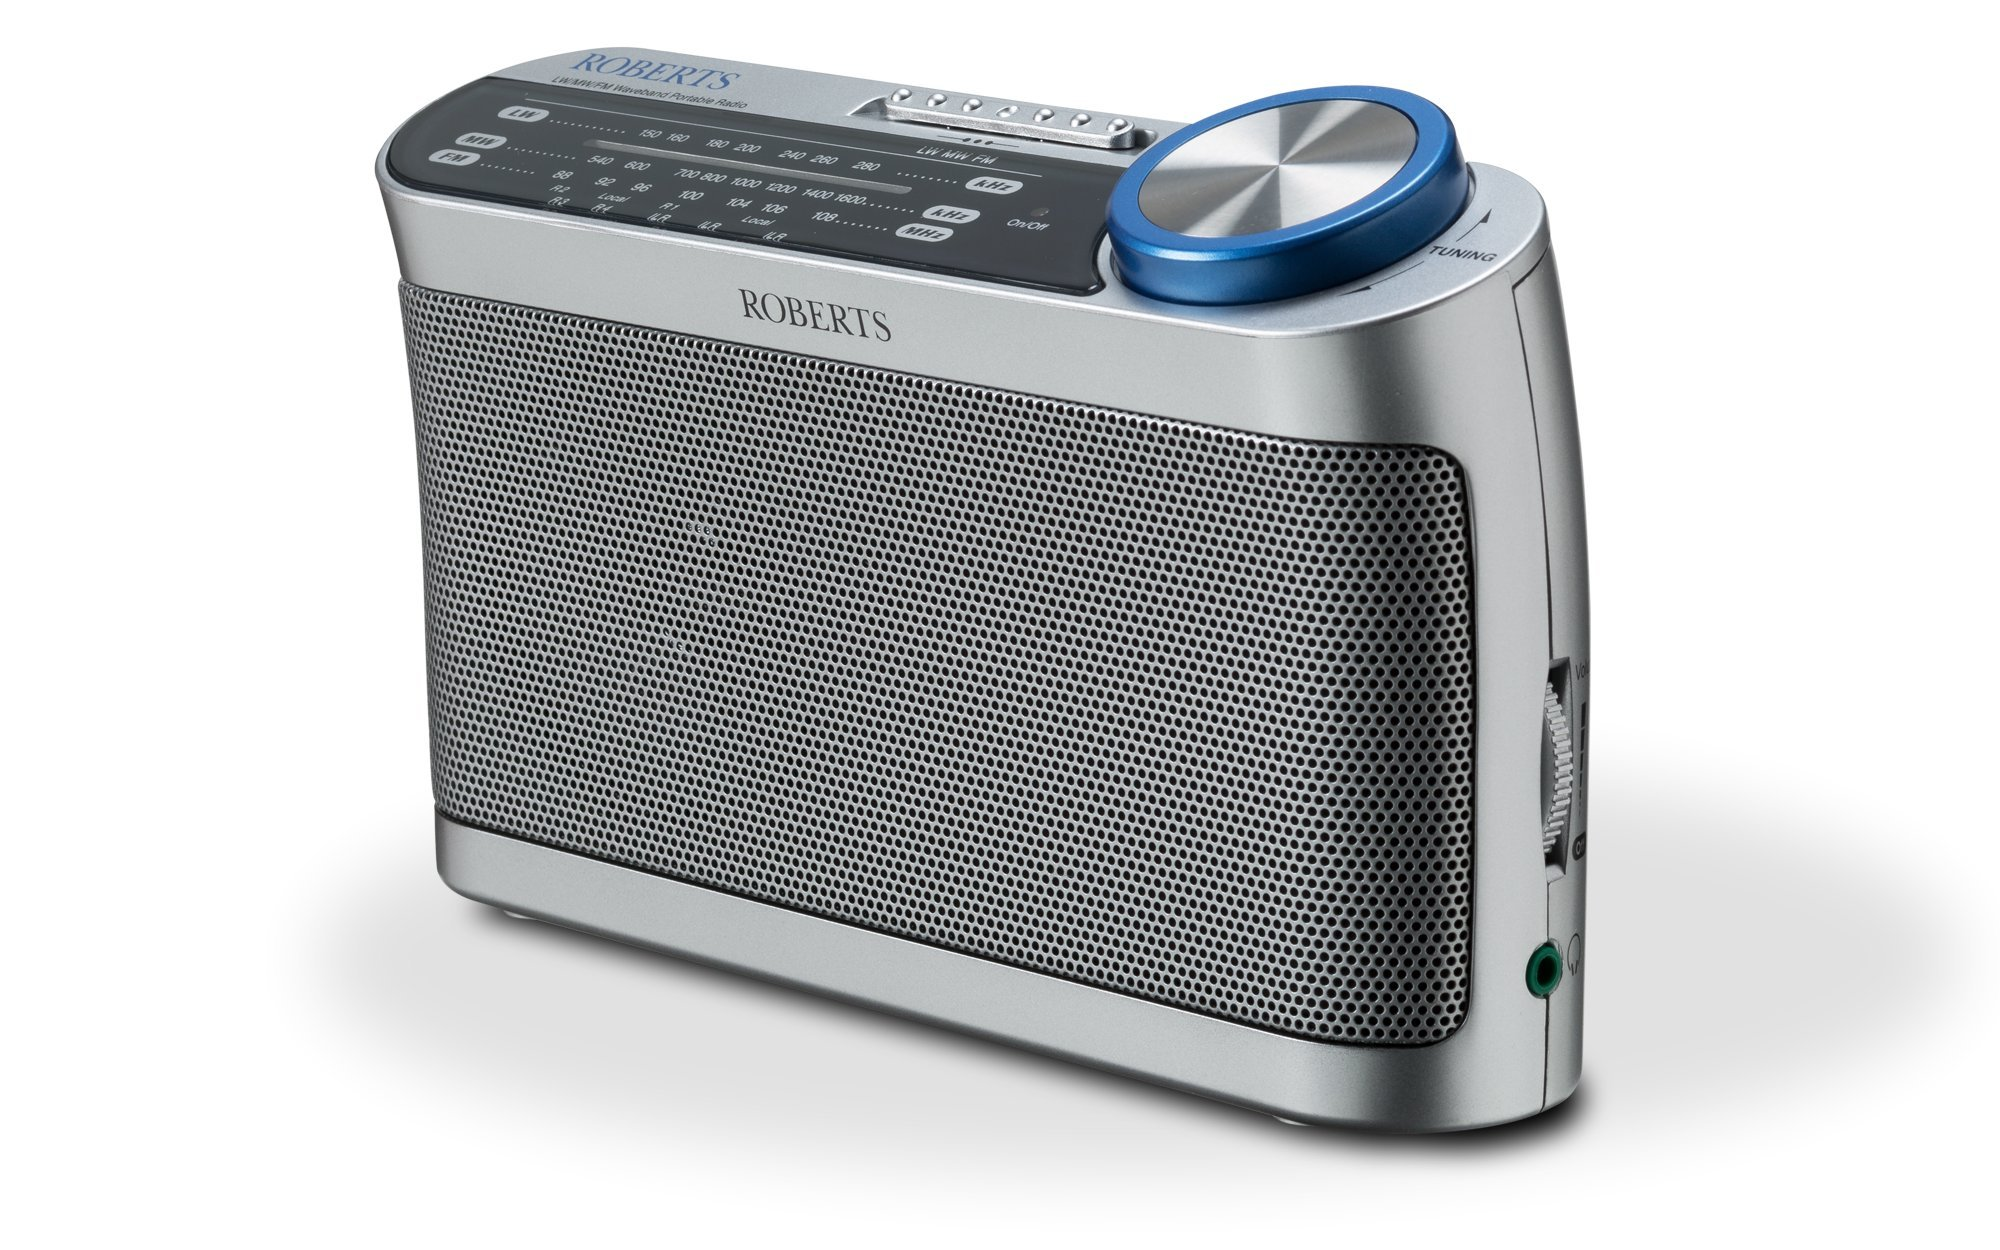 Roberts Radio R9993 Portable LW/MW/FM Radio with Headphone Socket 3